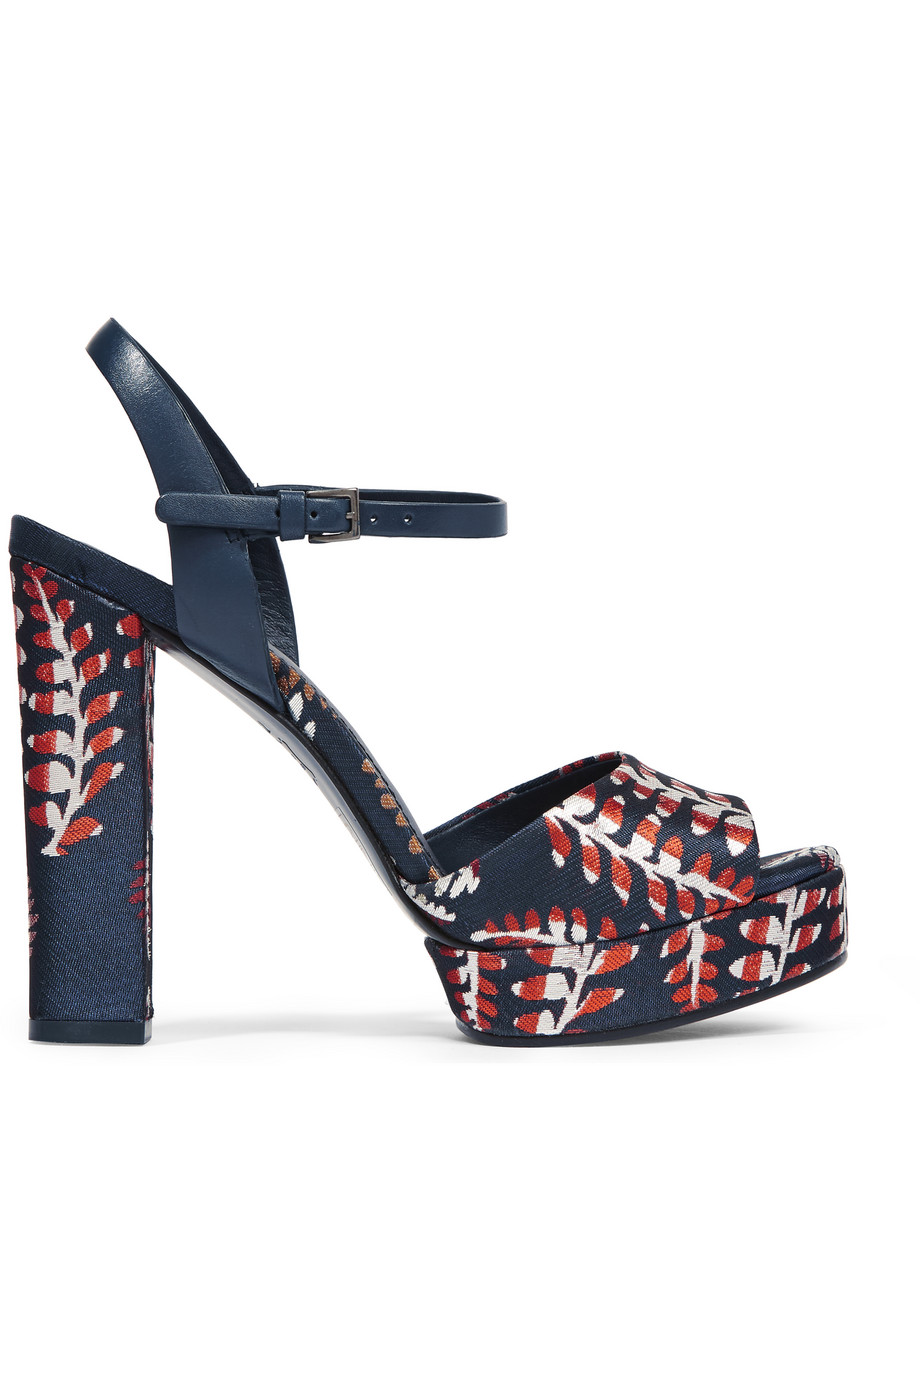 Tory Burch Solana Leather-Trimmed Jacquard Platform Sandals, Navy, Women's, Size: 9